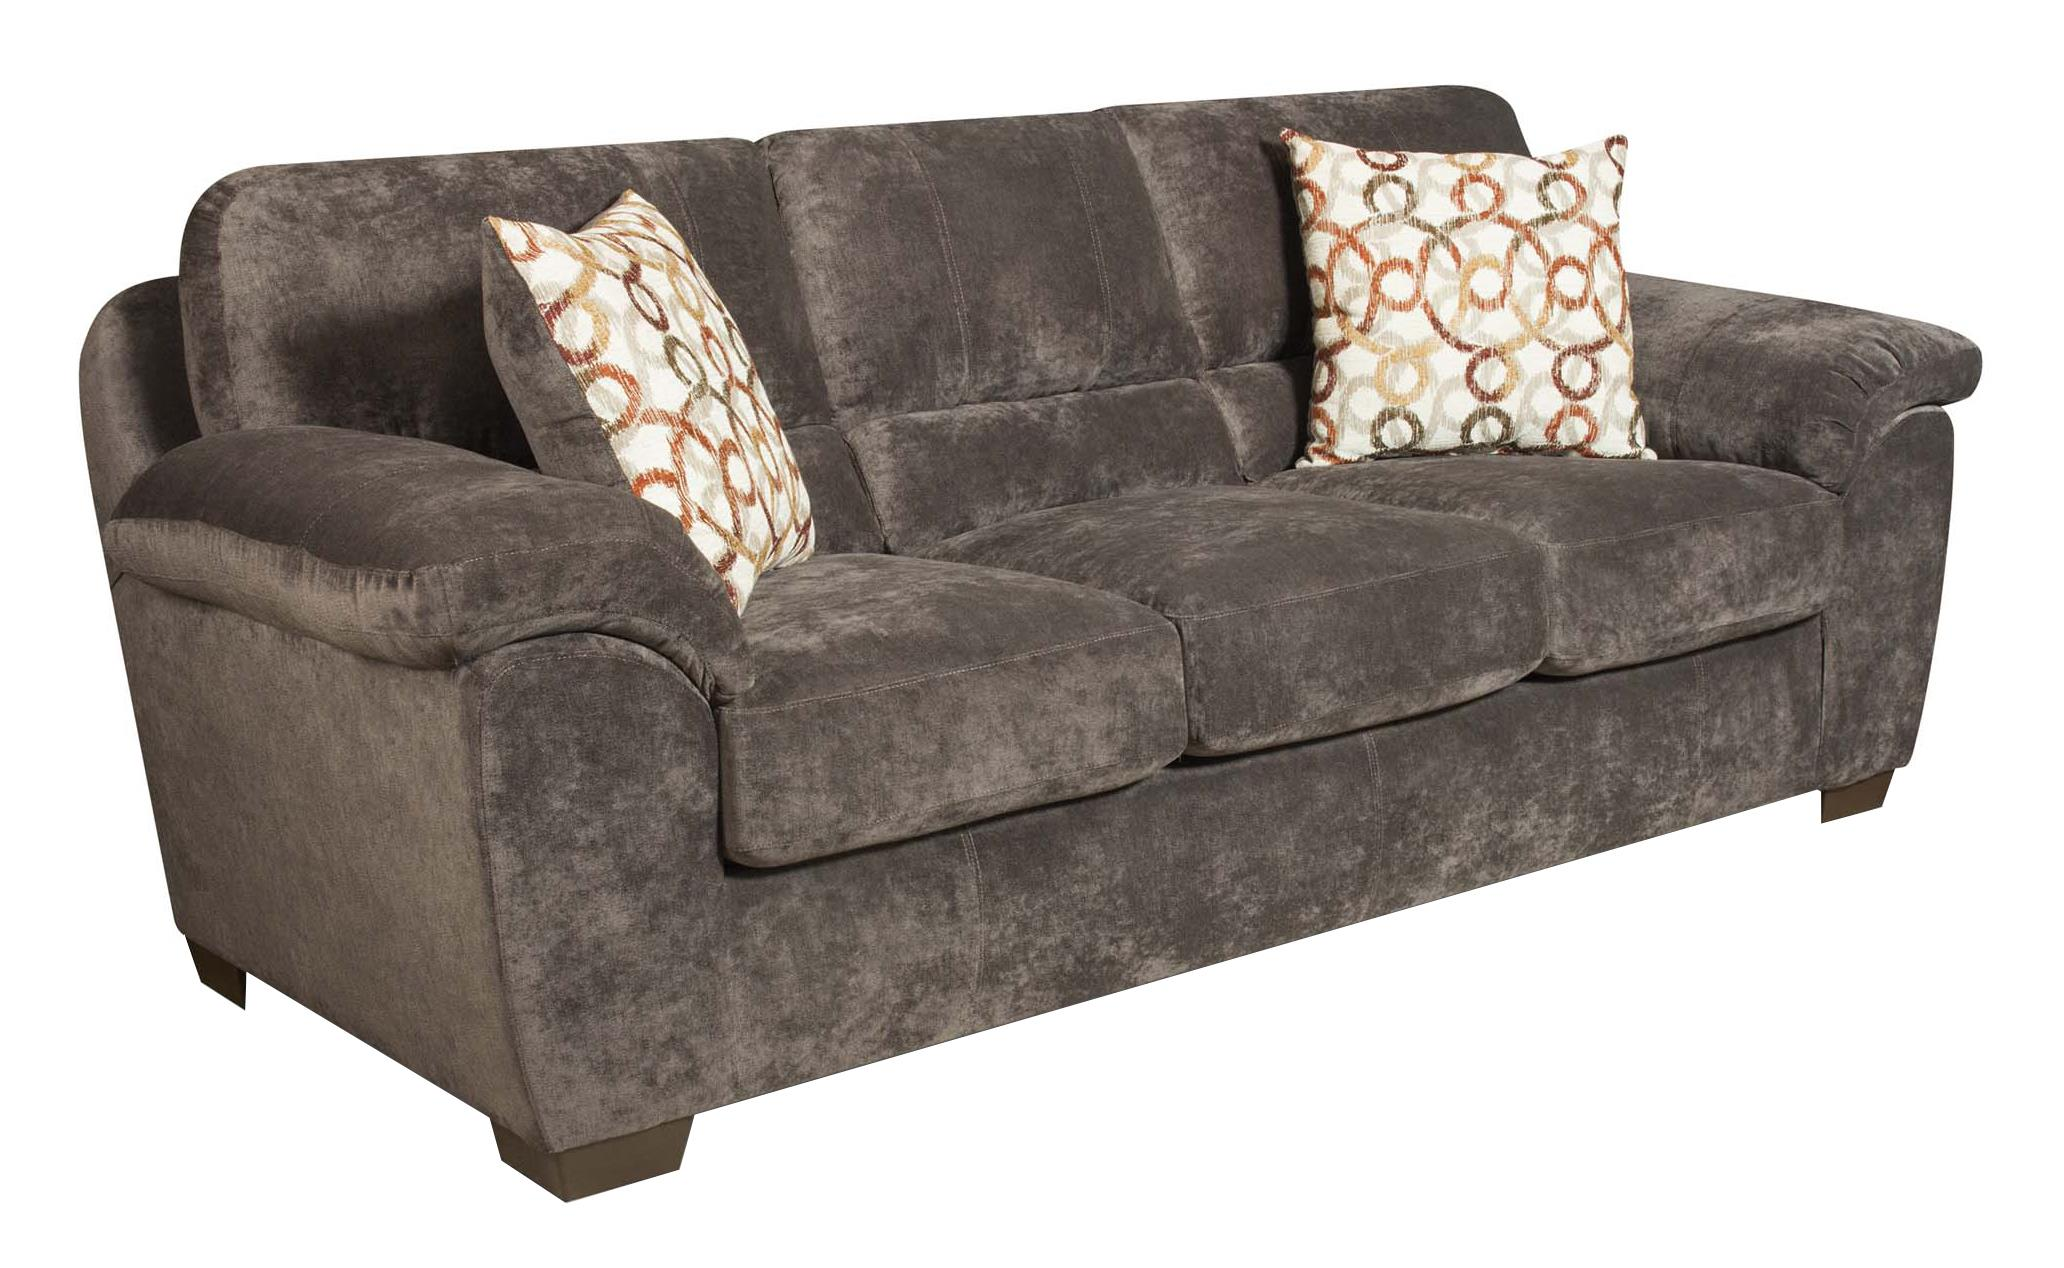 Casual Sofa 5450 By American Furniture Wilcox Furniture Sofa Corpus Christi Kingsville